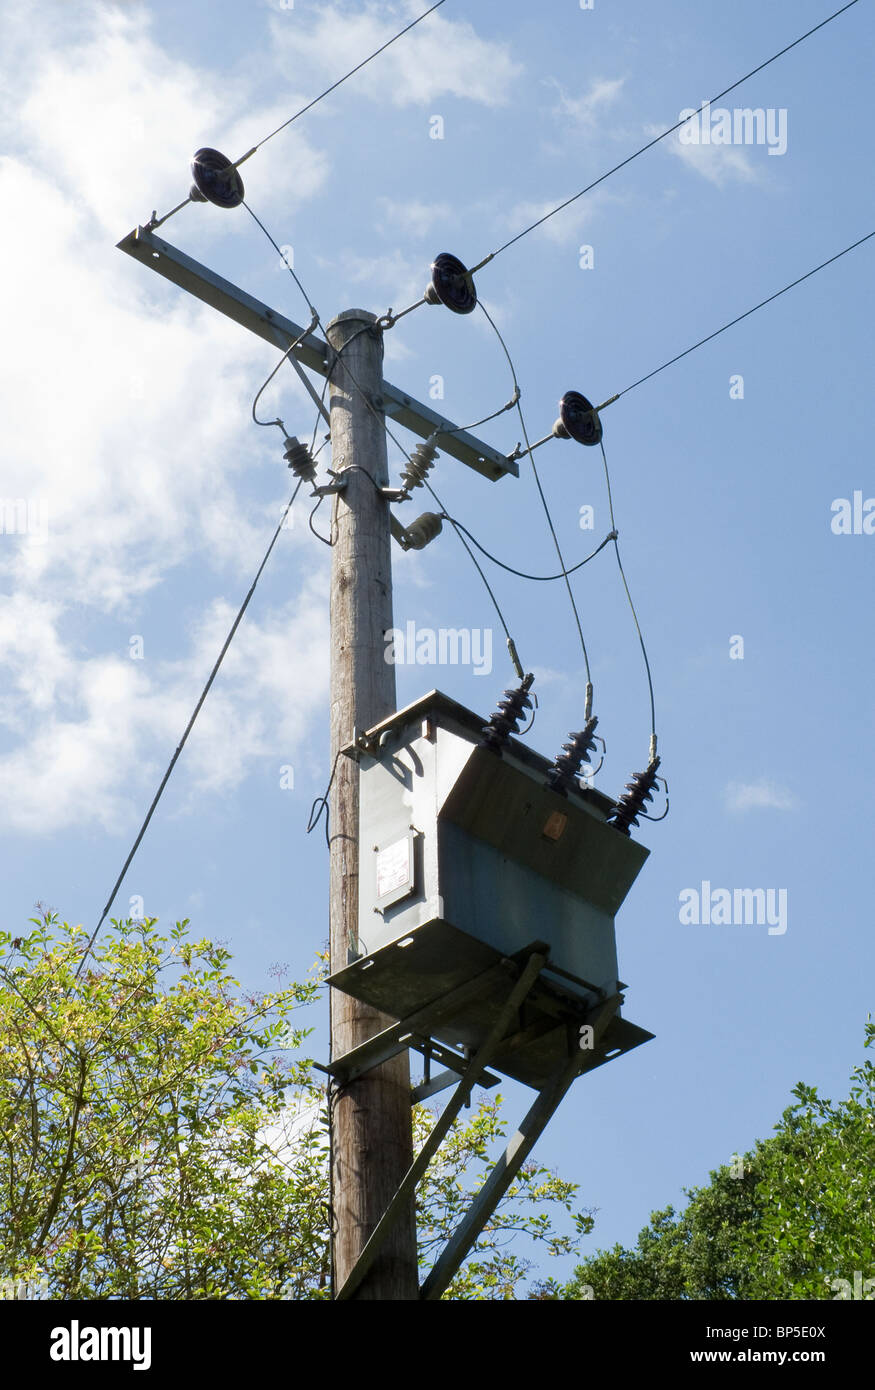 Pole mounted three phase transformer-1 - Stock Image